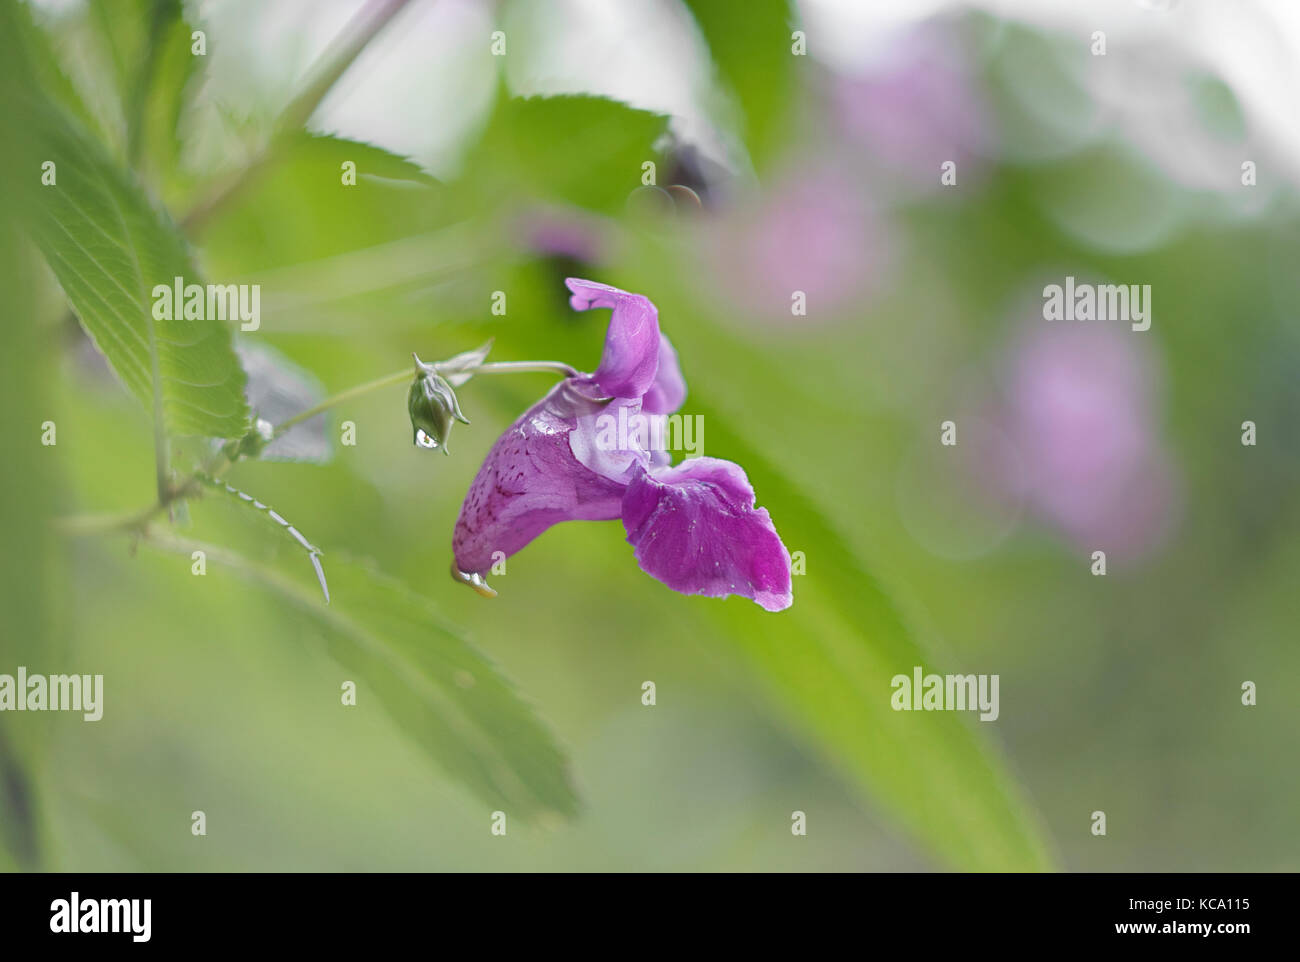 Impatiens glandulifera, single flower with green backround Stock Photo